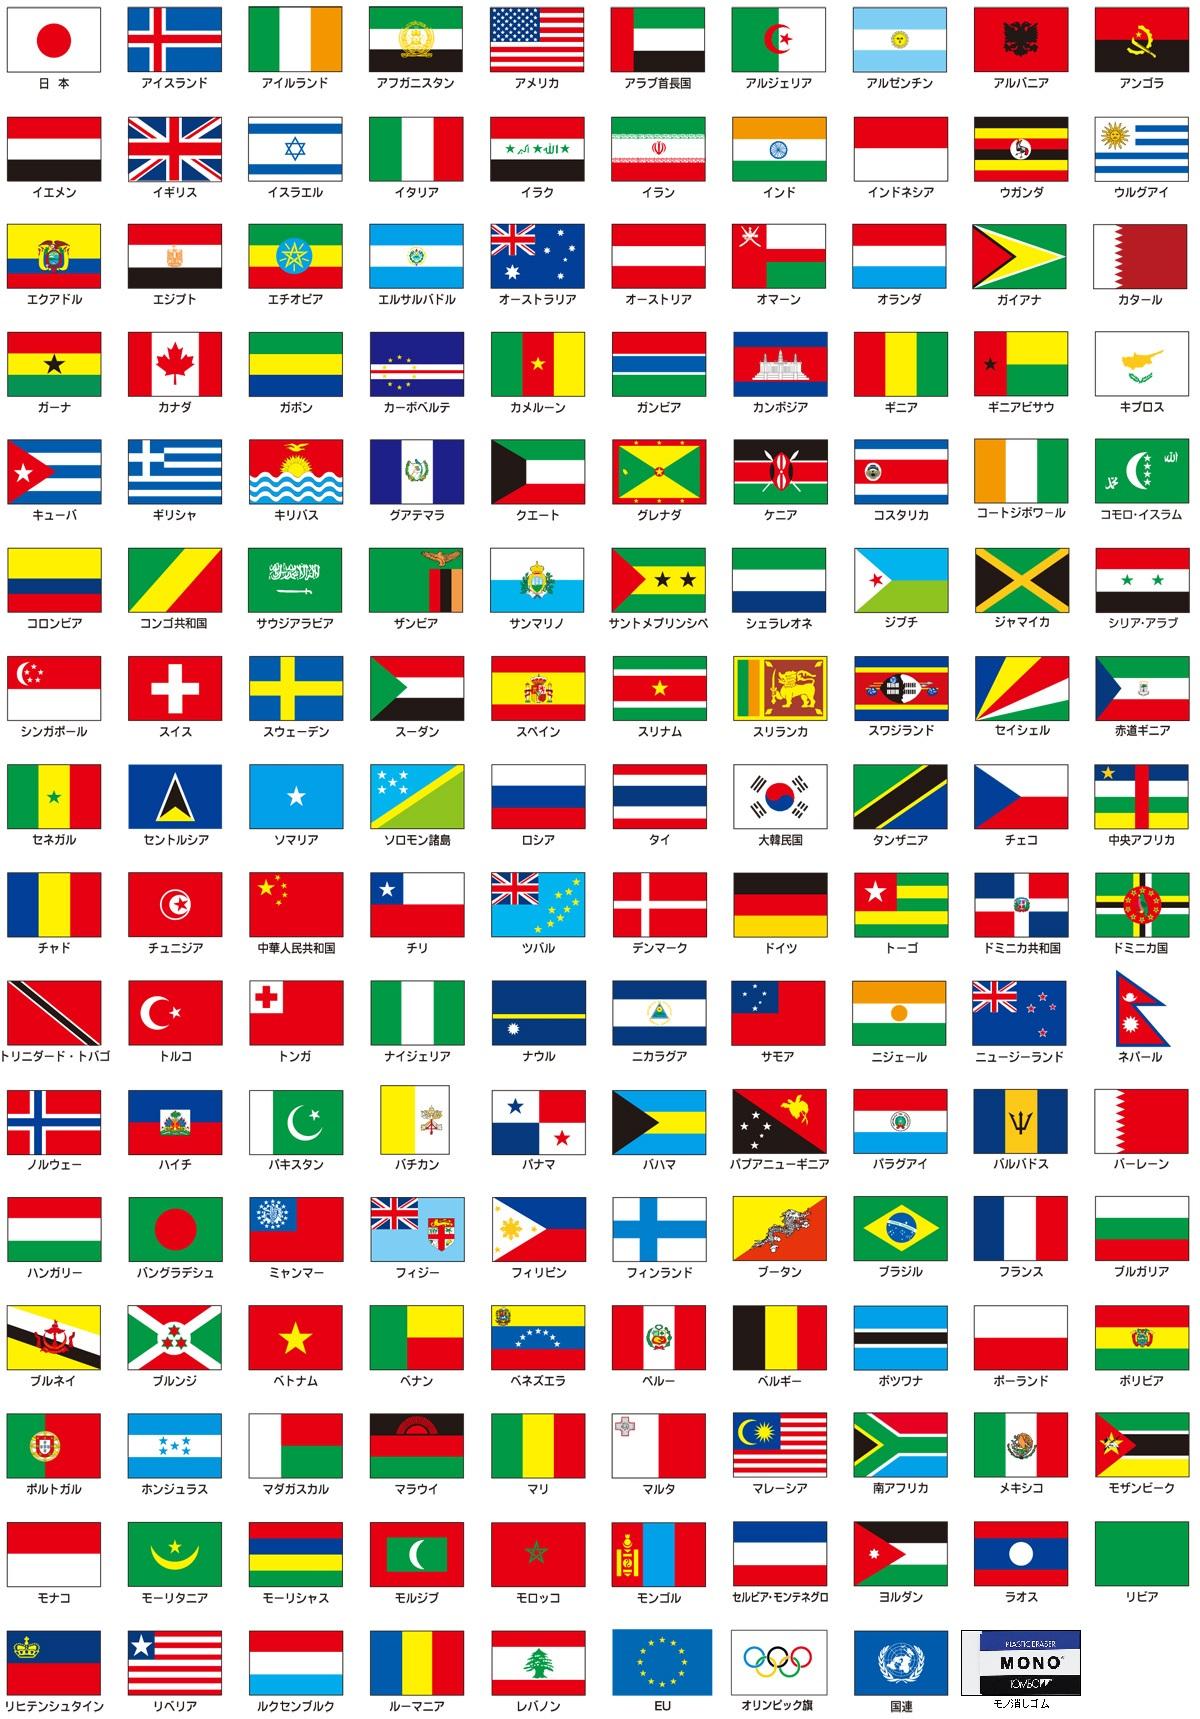 1 Microsoft Wwww Bing Com: 世界の国旗にモノ消しゴム混ぜても違和感なさすぎワロタwwww : とろ速